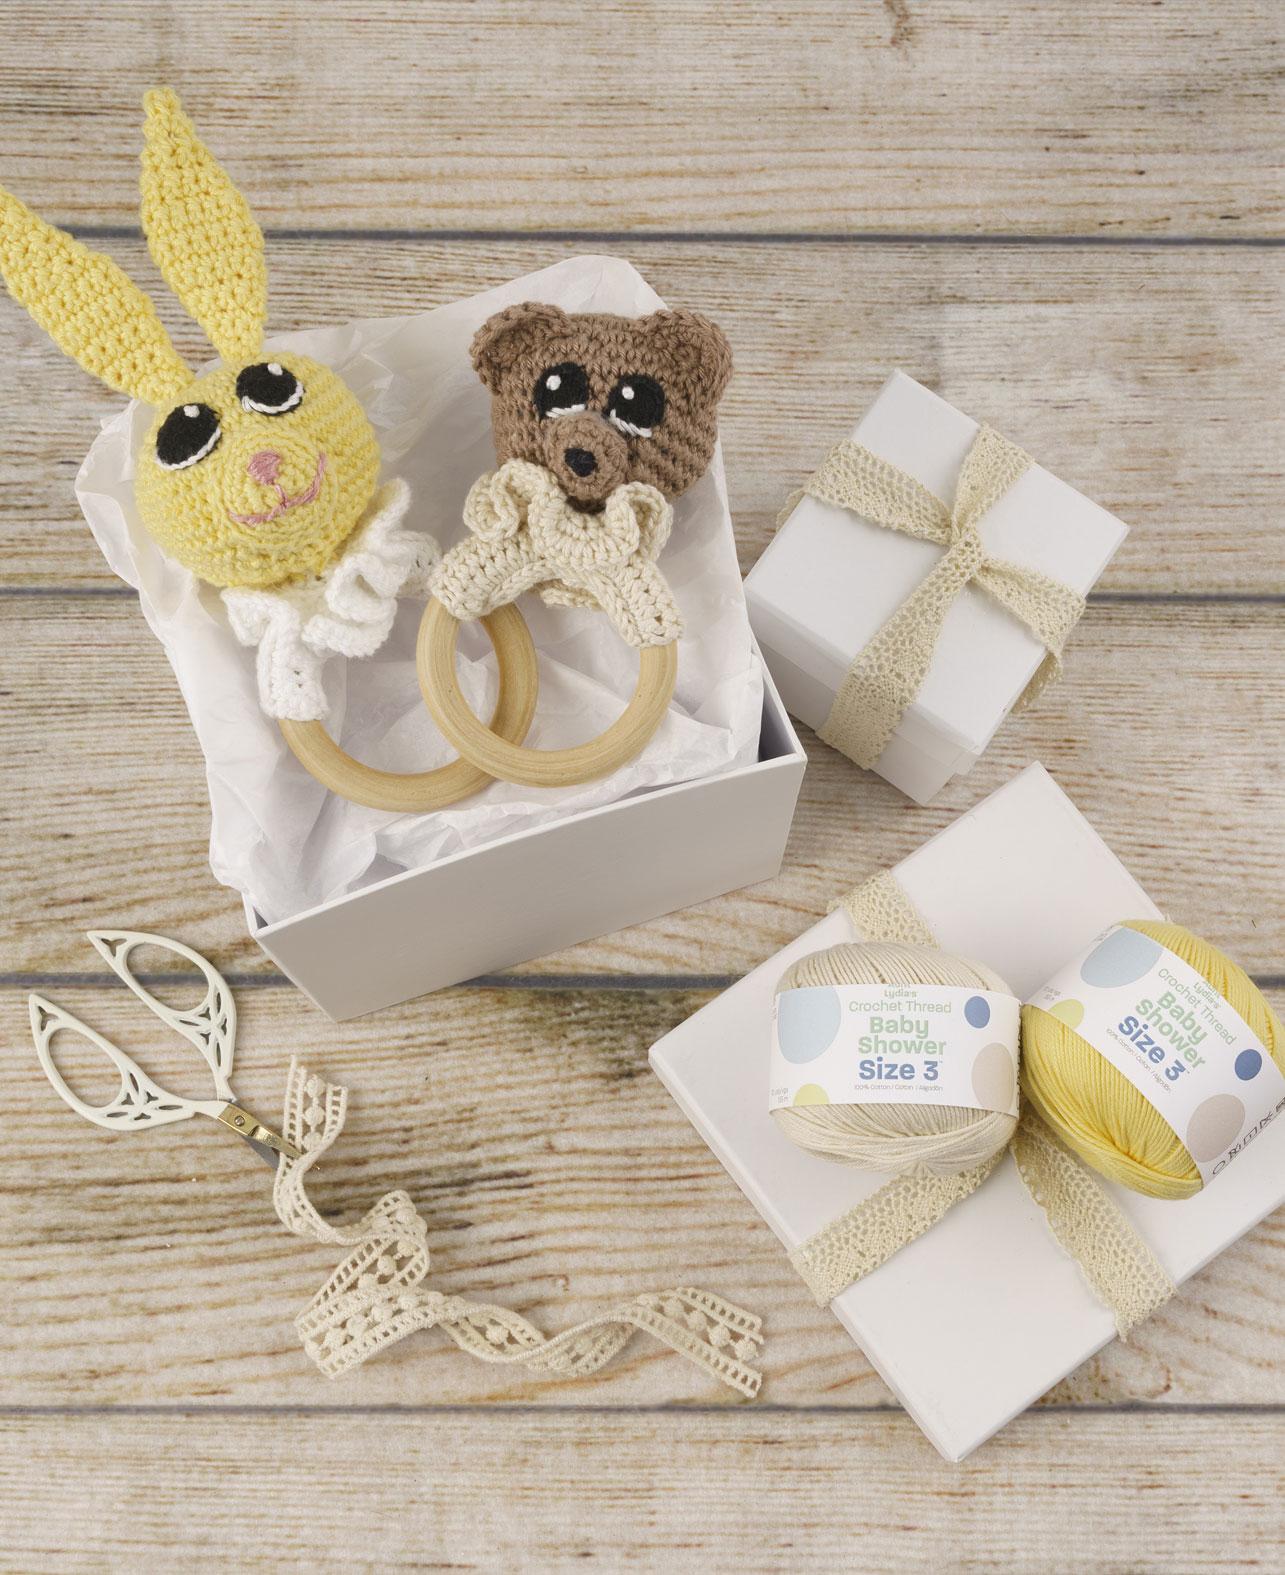 Aunt Lydia's Bunny & Bear Teething Rings